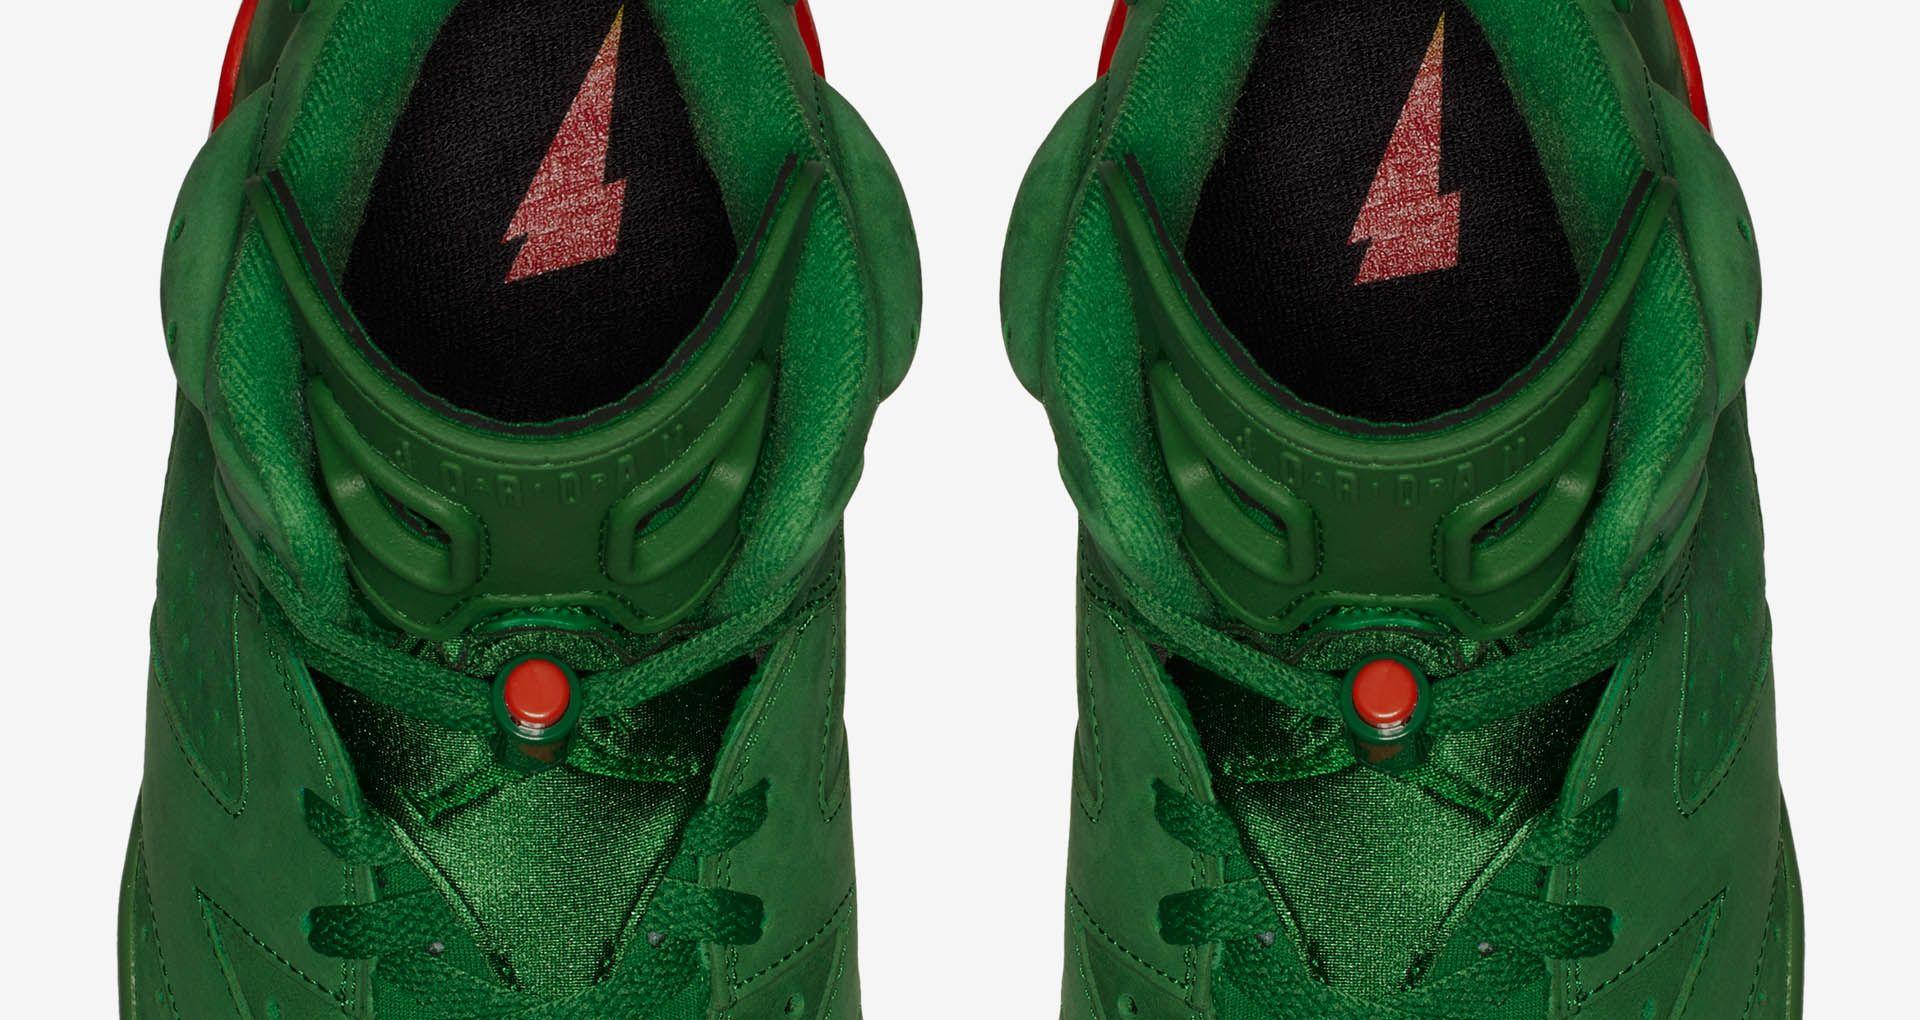 4633e60399c5 Air Jordan 6 Gatorade  Pine Green  Release Date. Nike+ SNKRS